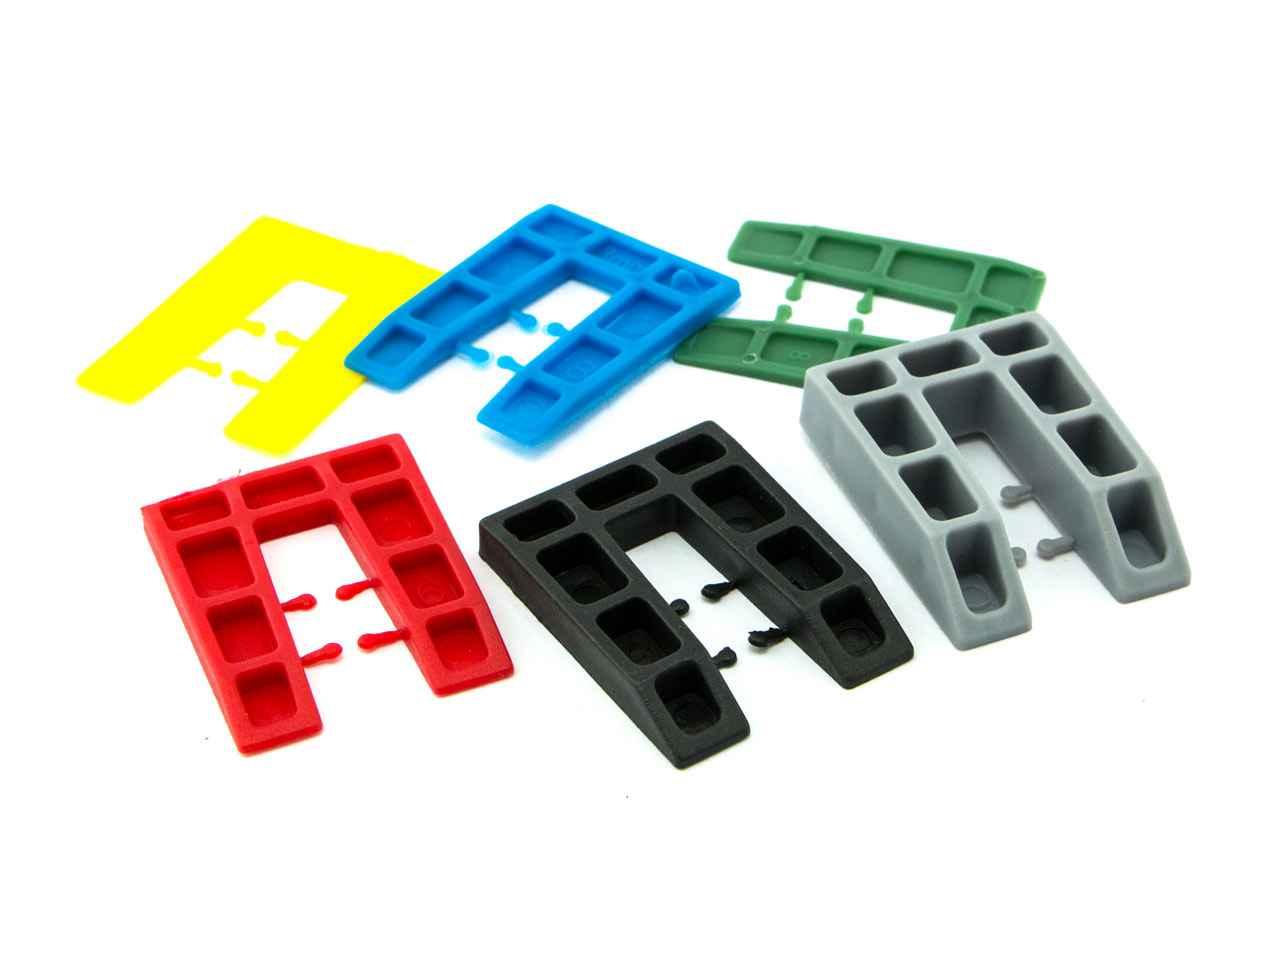 2 Adjustable Drag Links for Right  409599 532409599 /&  Left  409600 532409600,